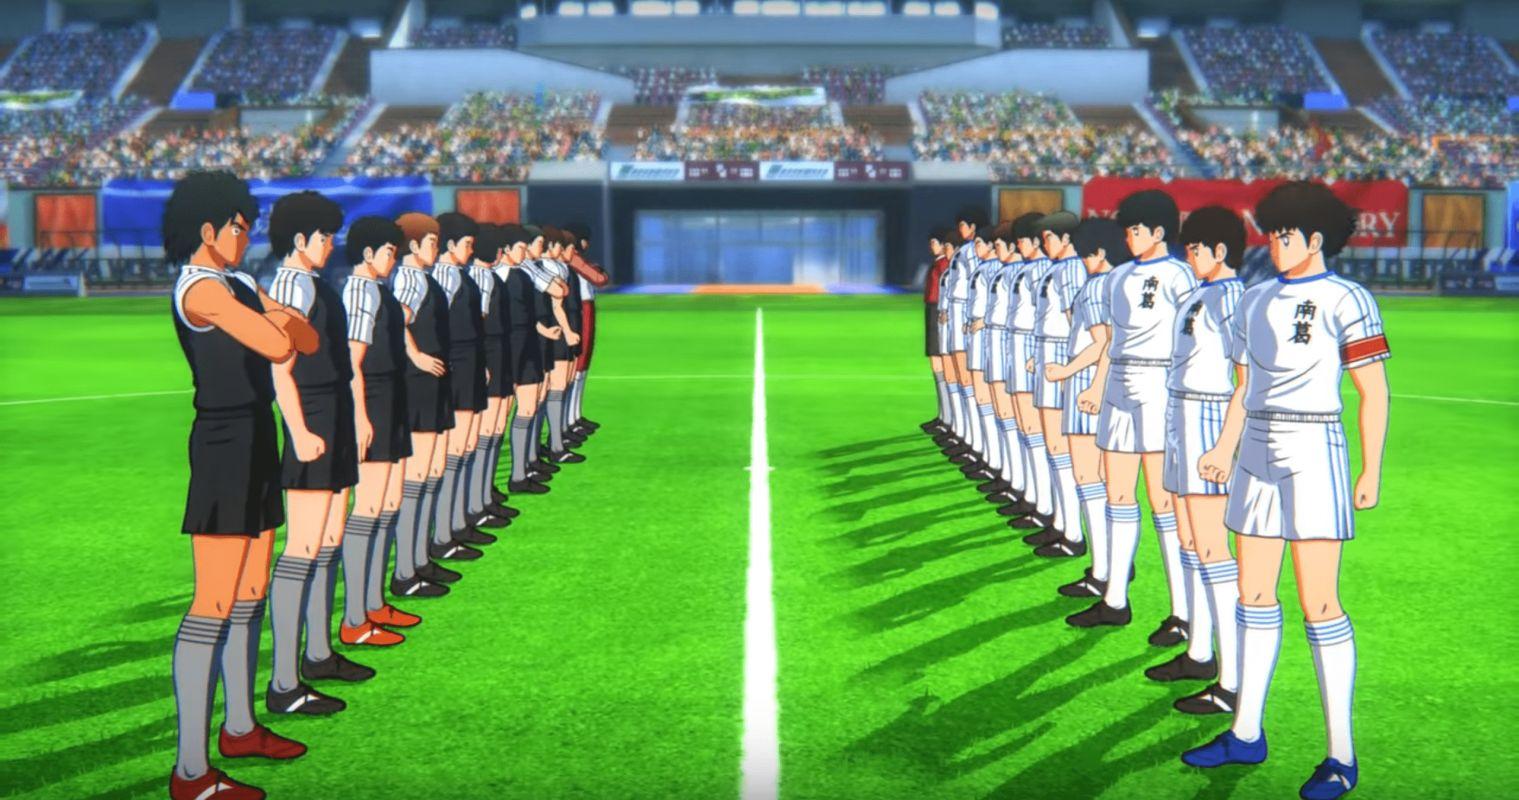 Un gros trailer de gameplay pour Captain Tsubasa : Rise of the New Champions